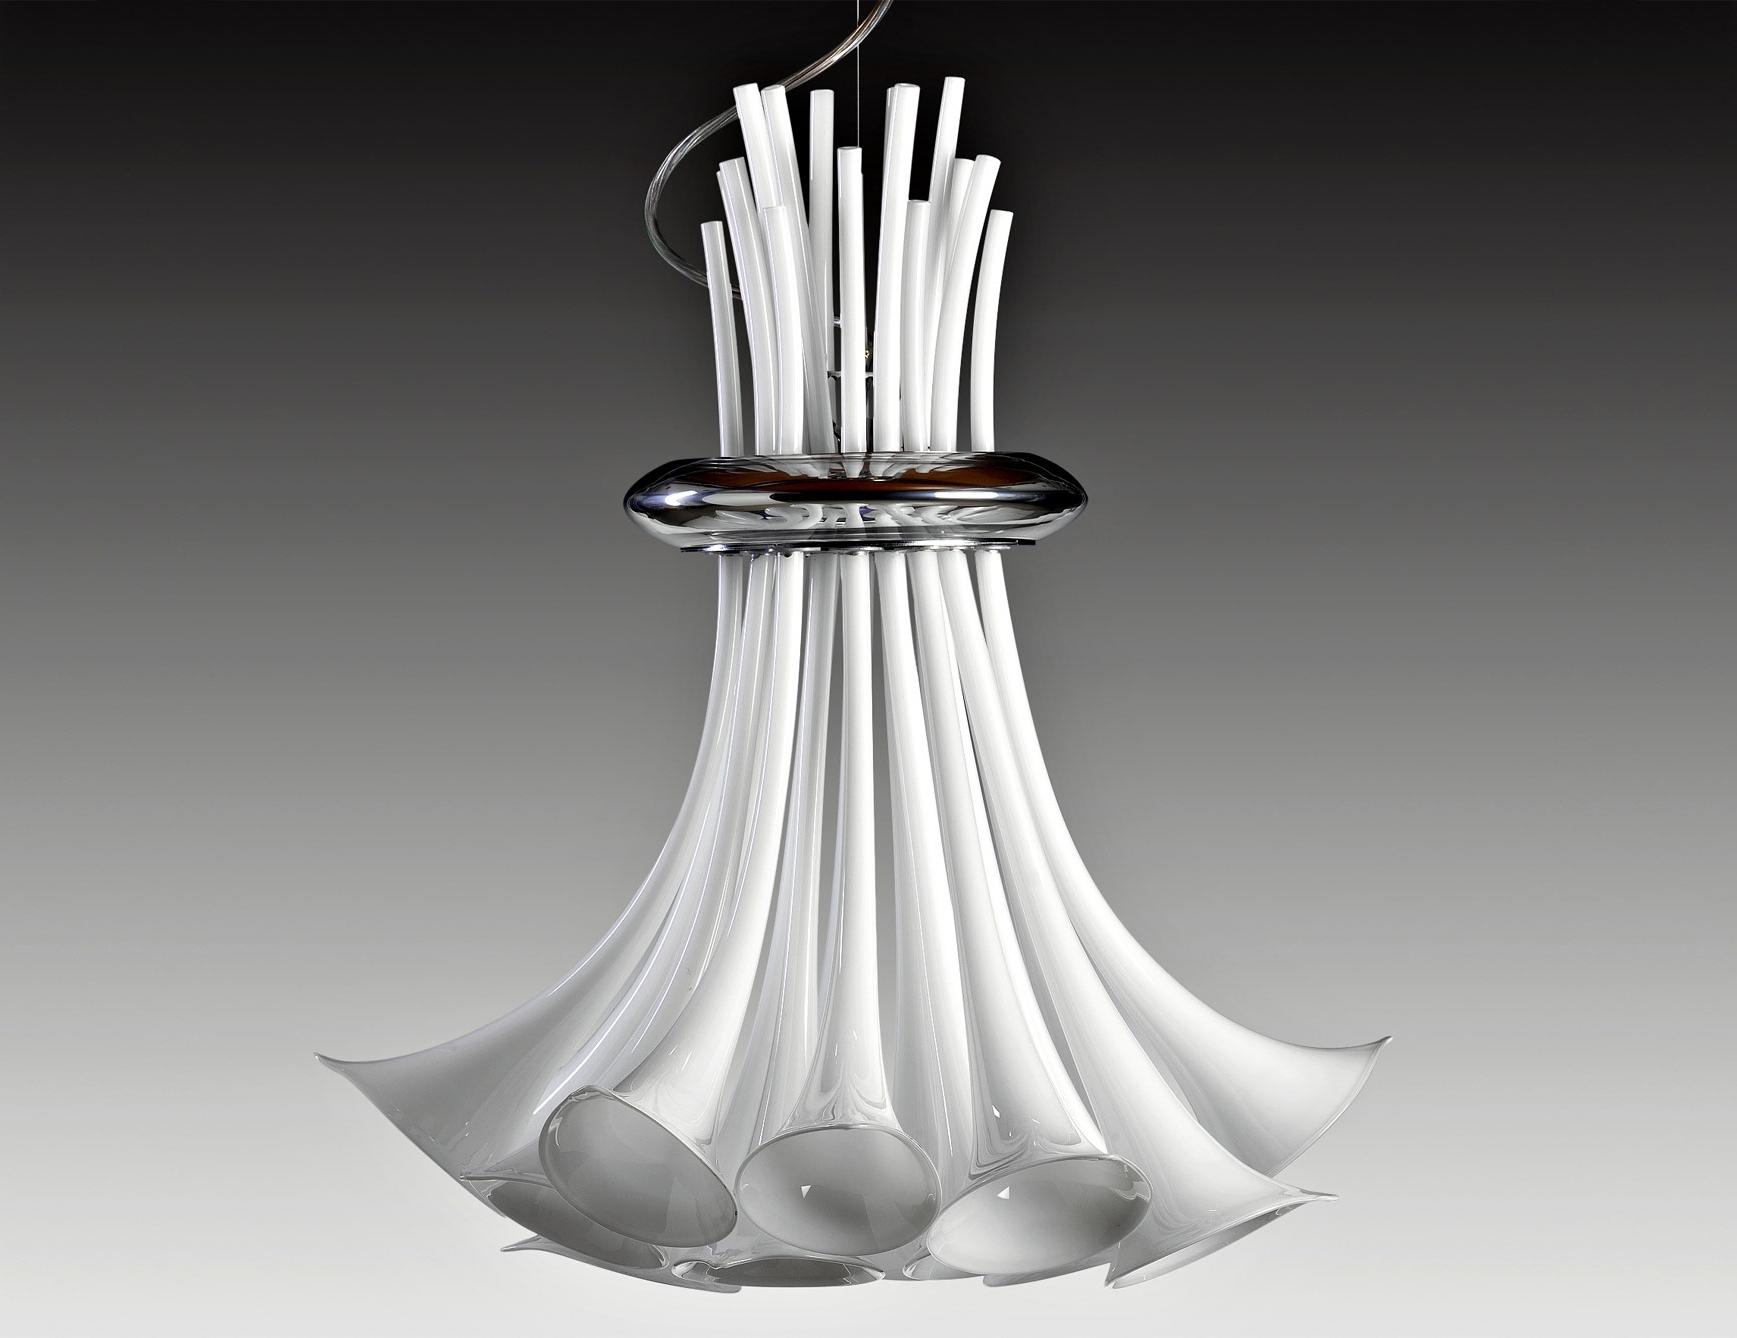 Well Liked Nella Vetrina Zante 10002 Italian Hanging Light White Murano Glass Intended For Modern Italian Chandeliers (View 11 of 15)